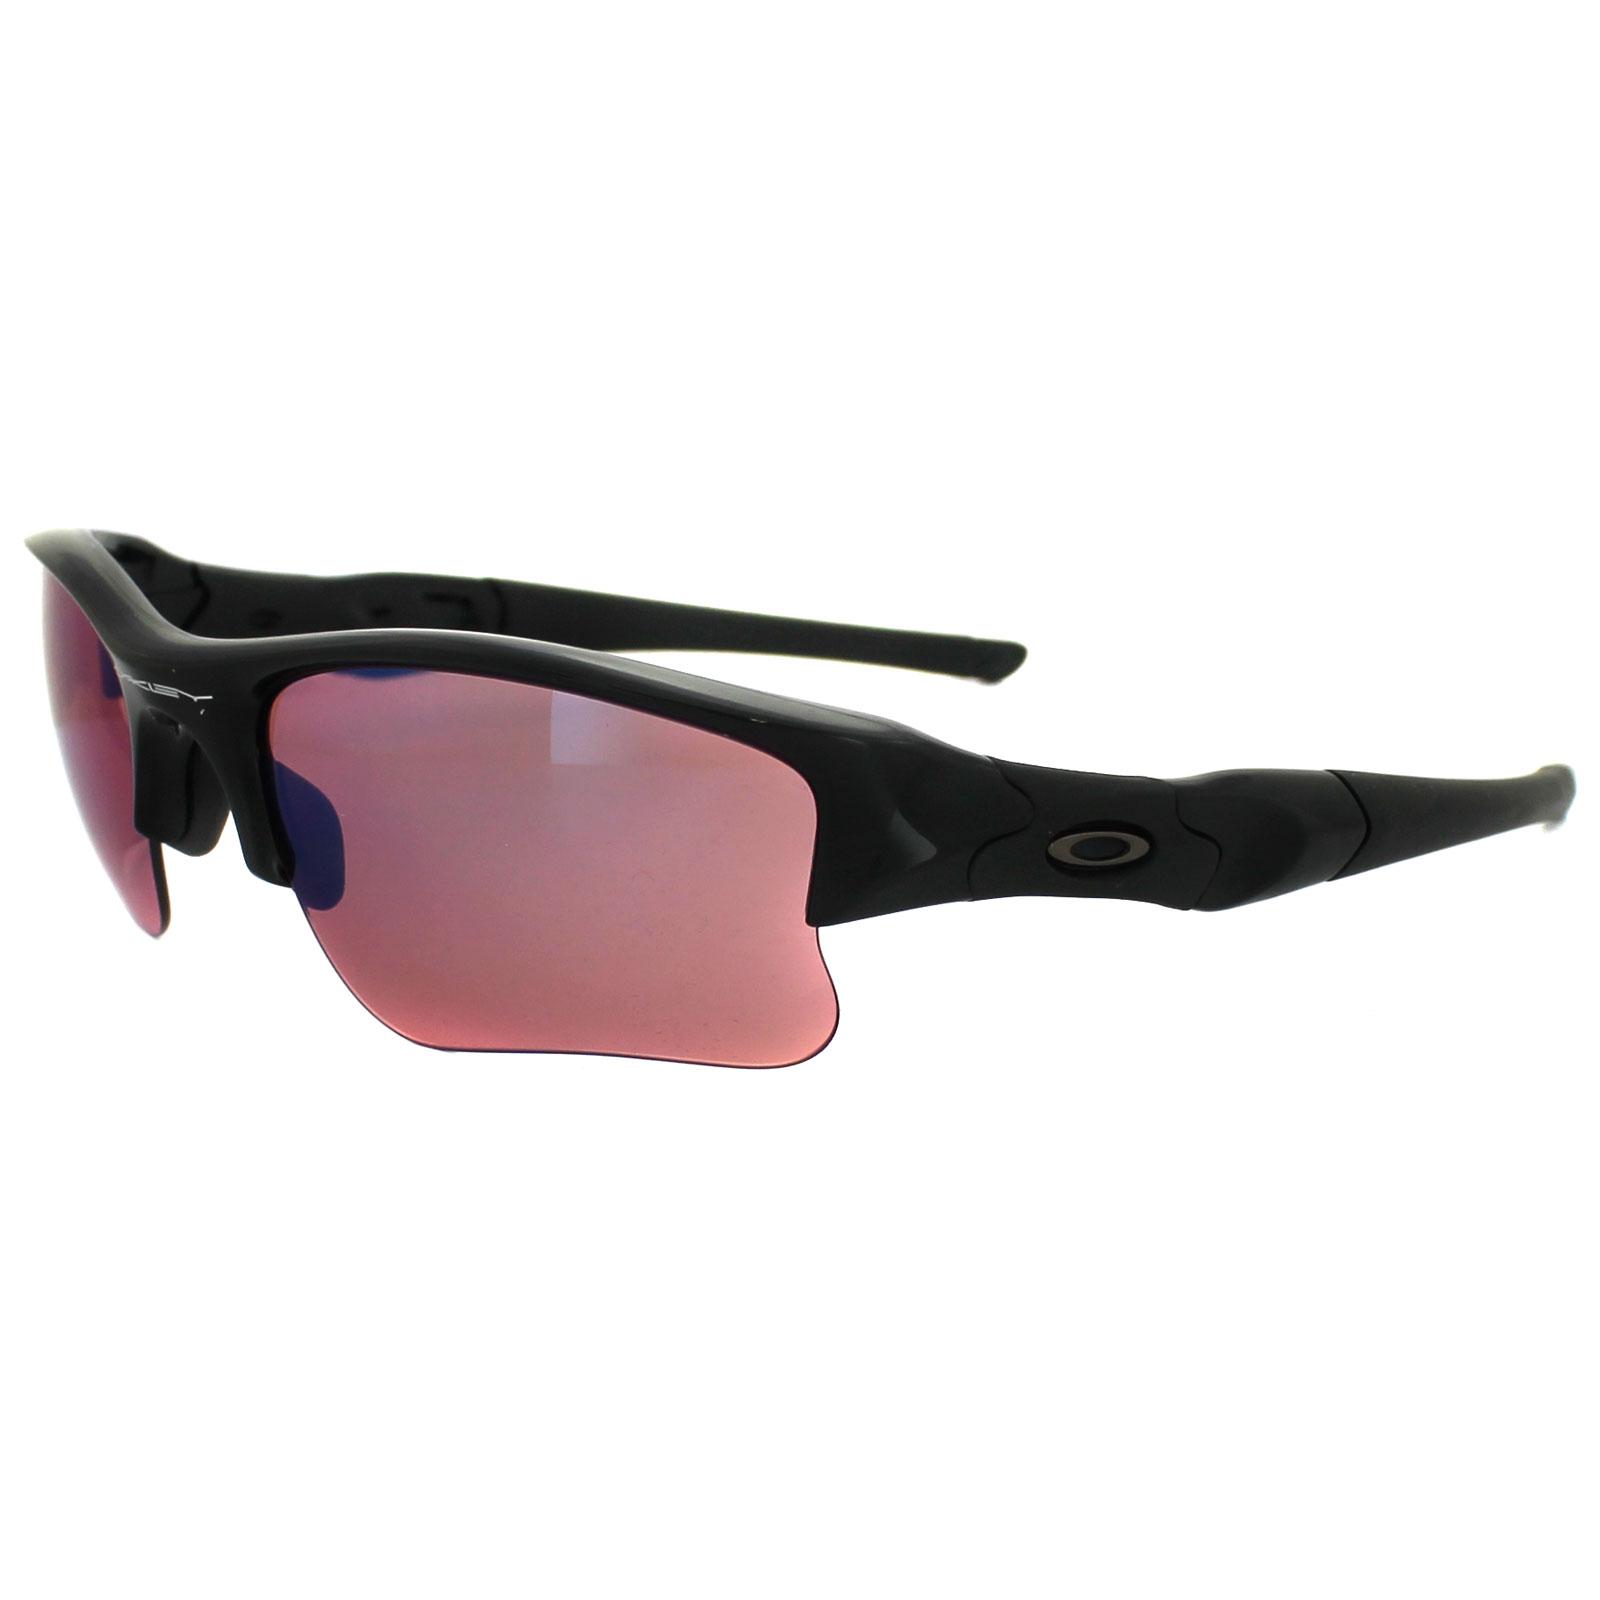 a16df02c558ab ... shopping sentinel oakley sunglasses flak jacket 26 239 polished black  g30 iridium bb494 cb7e6